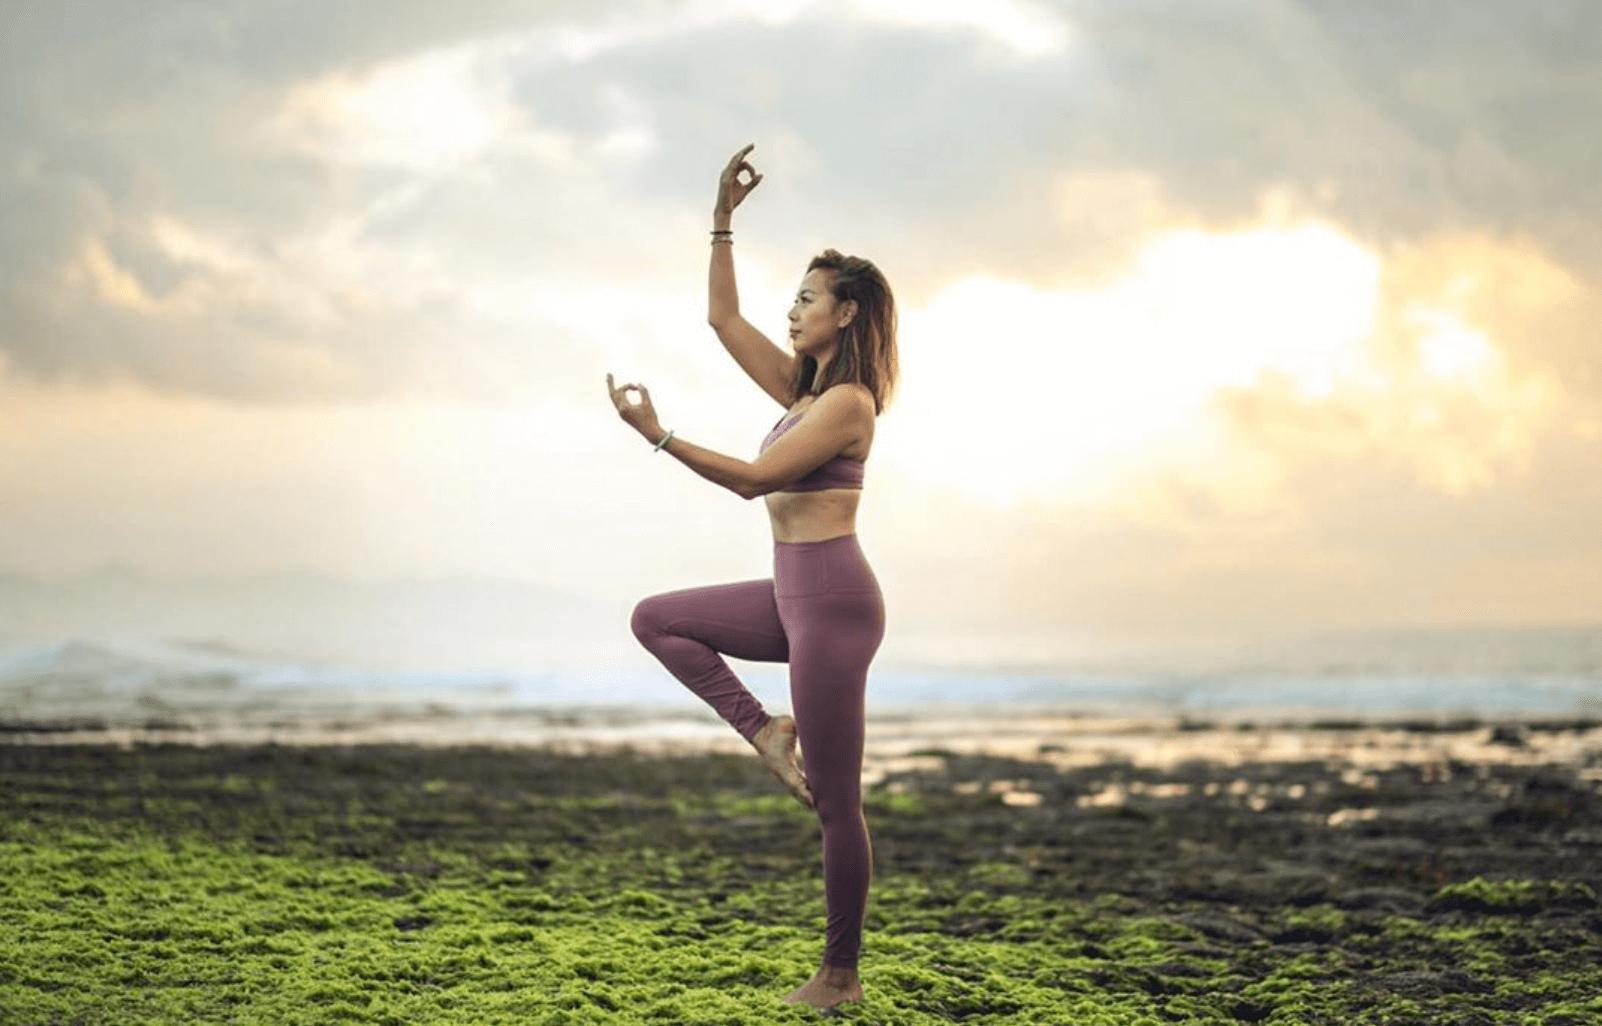 Margaret演員轉職為瑜伽導師,身型弗到爆